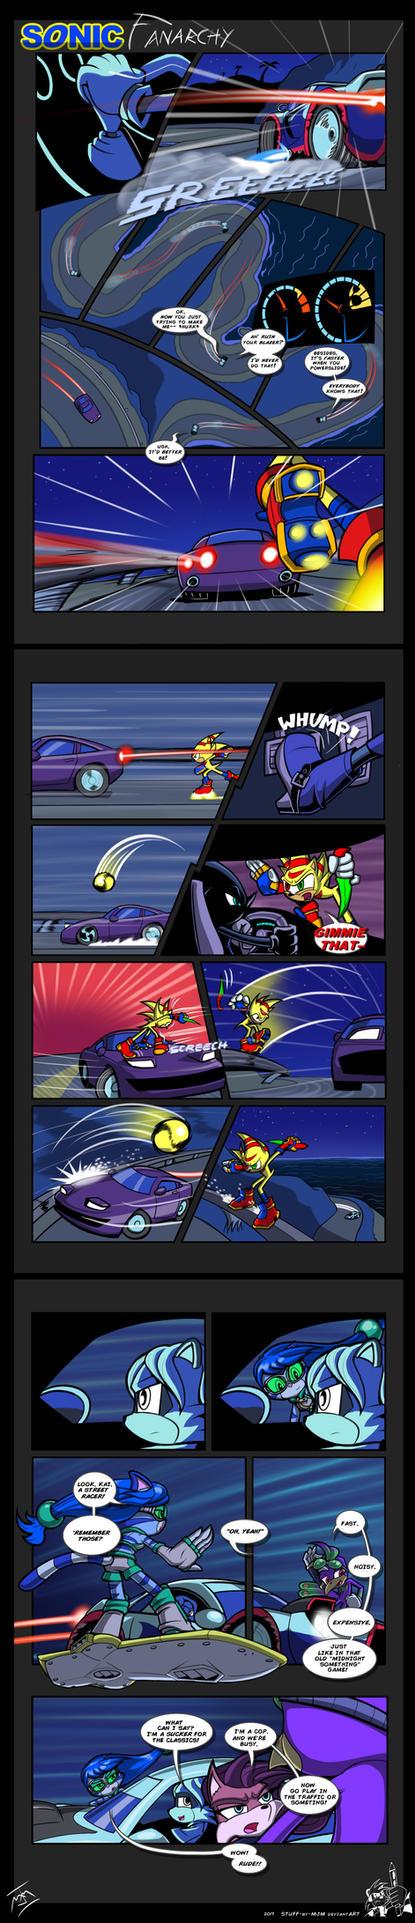 Sonic Fanarchy - 10-12 by STUFF-by-MJM